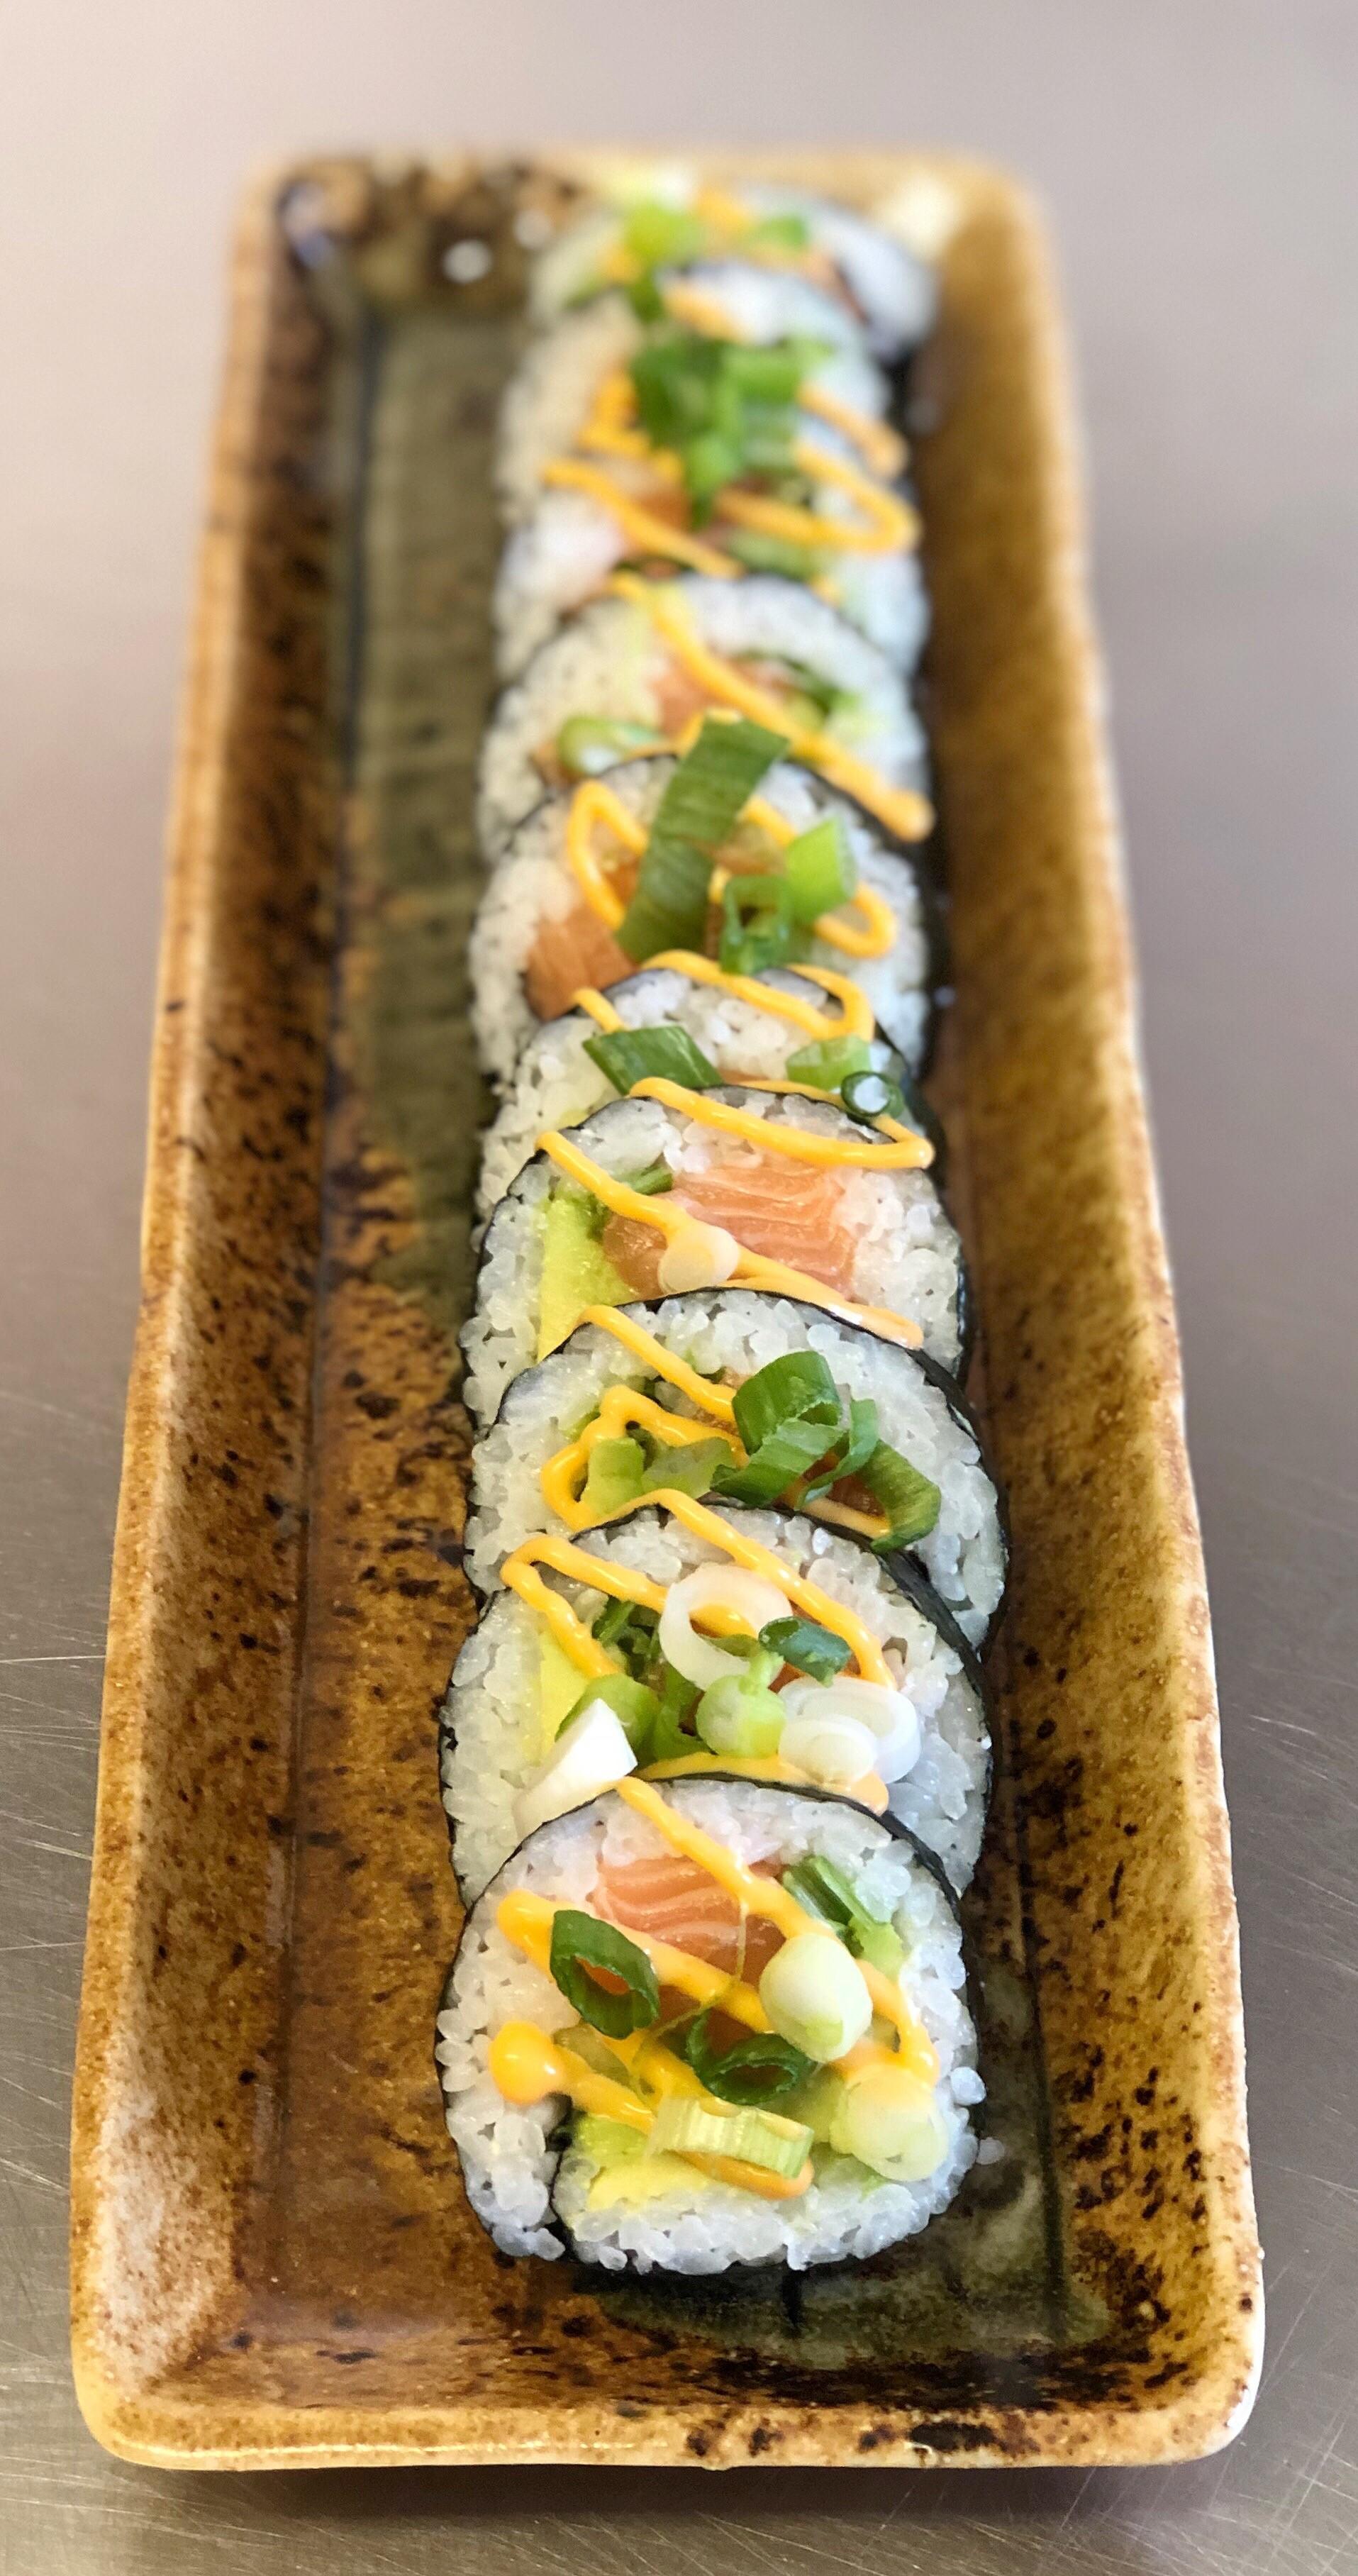 Spicy Salmon Futomaki - £7